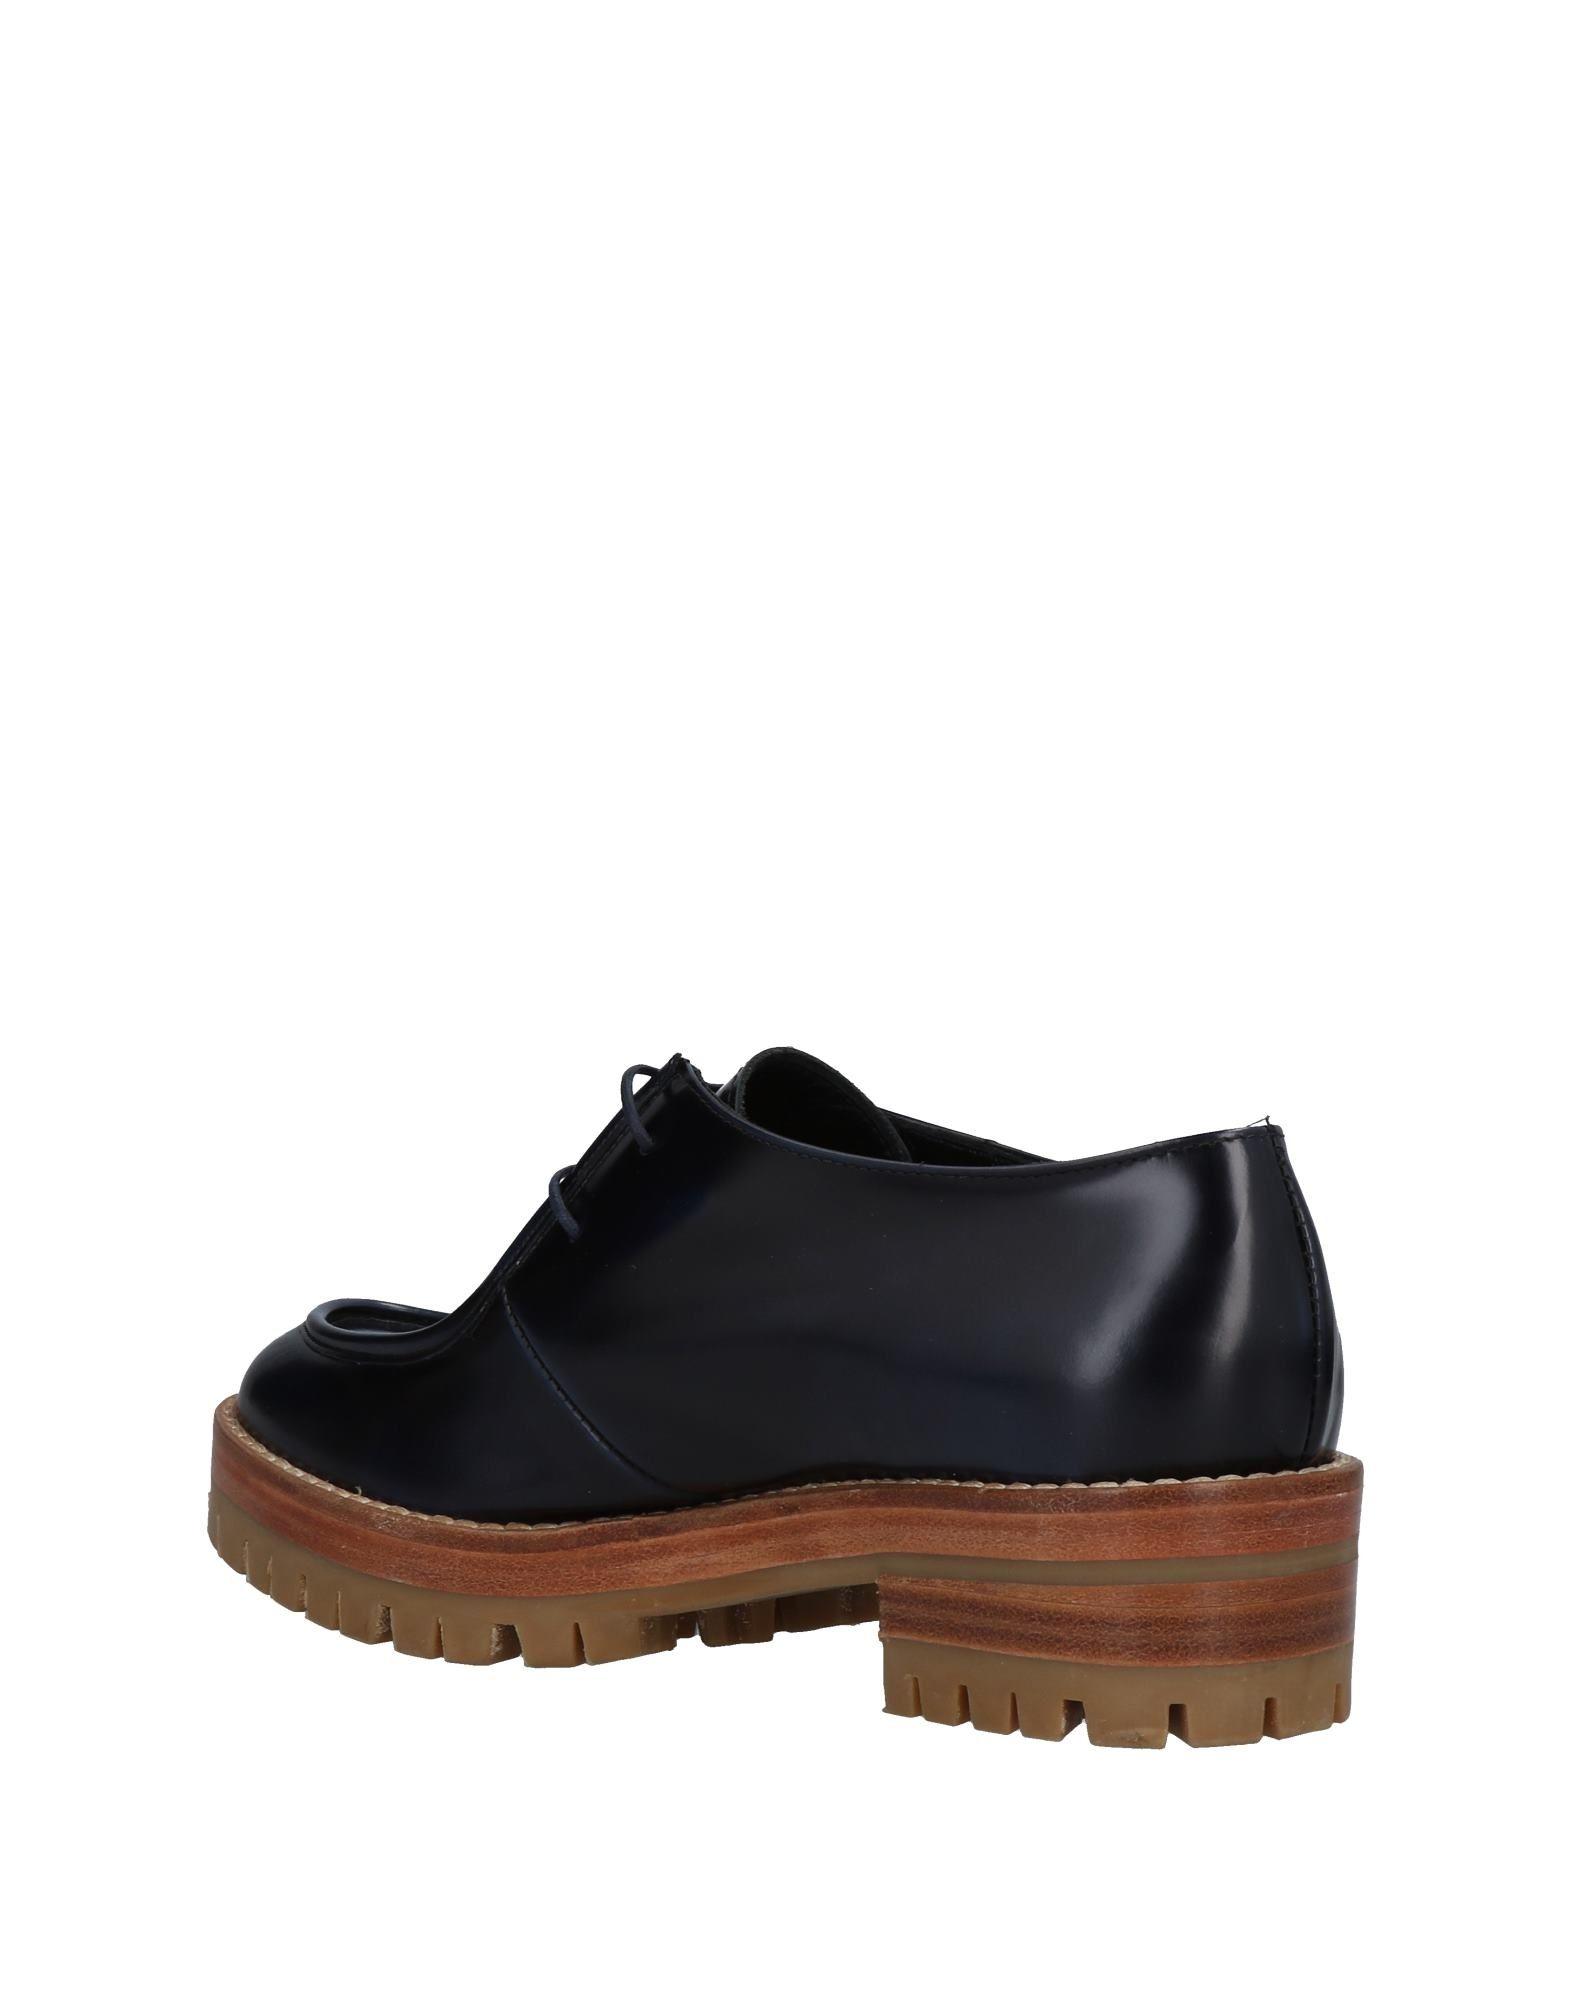 Le 11486912XV Marinē Schnürschuhe Damen  11486912XV Le Gute Qualität beliebte Schuhe faf99a